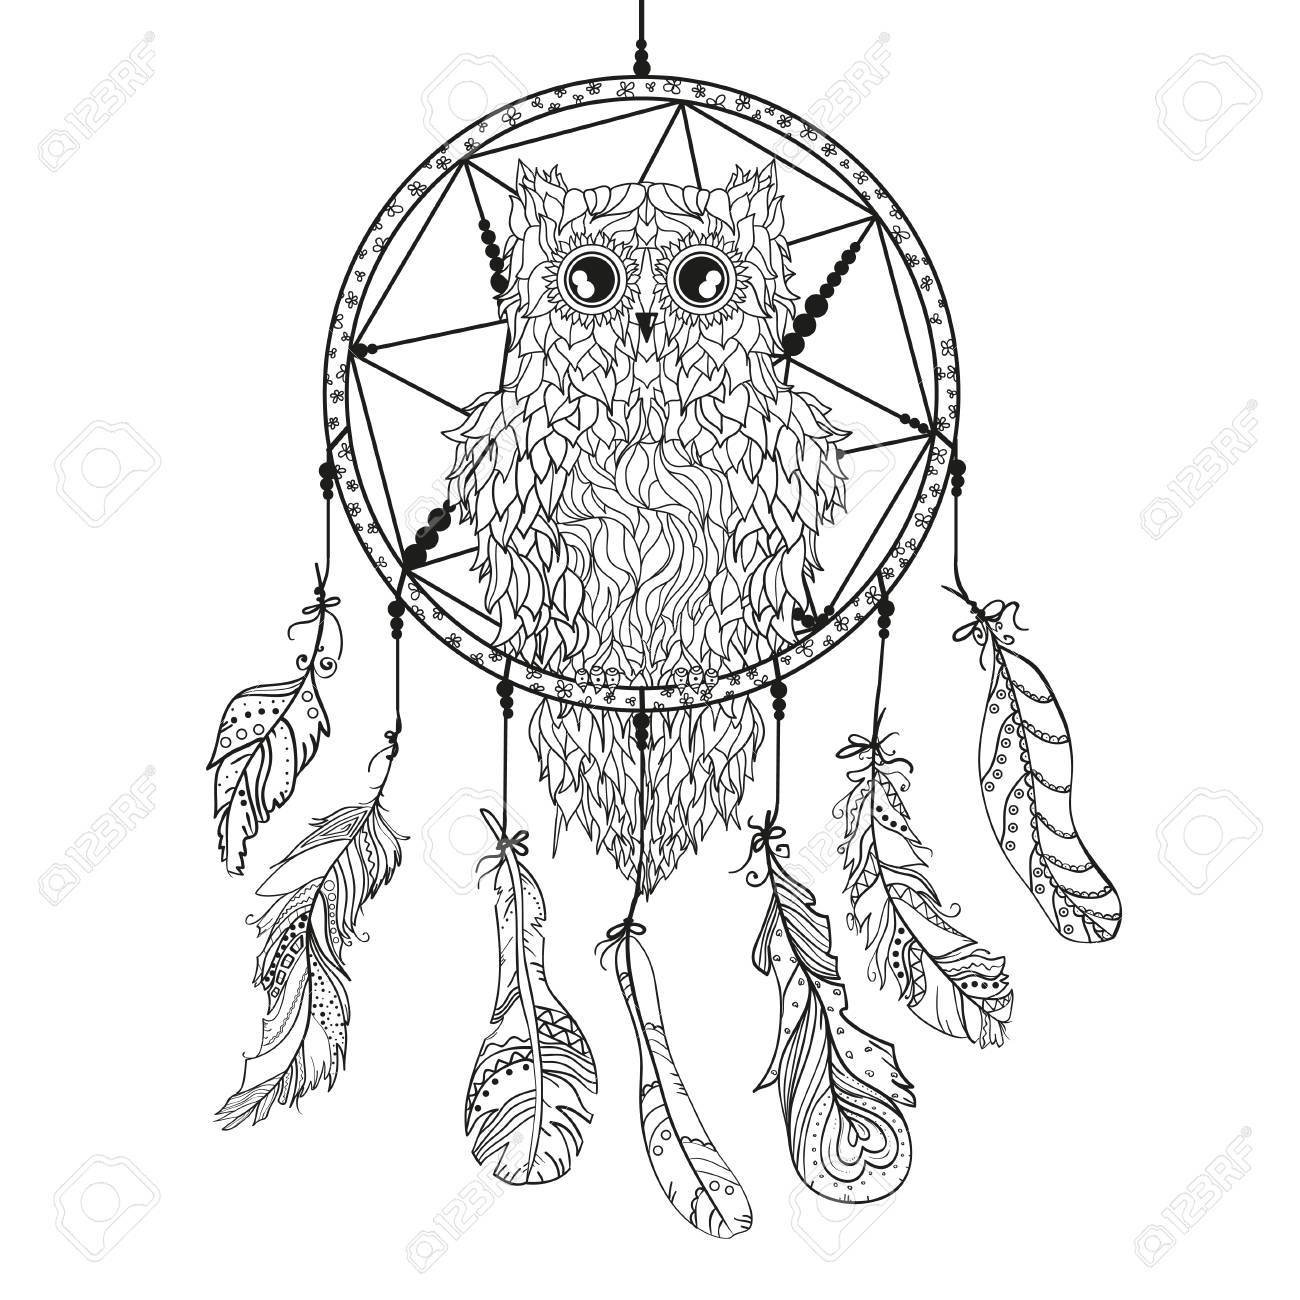 Atrapasueños Búho Arte Del Tatuaje Símbolo Místico Plumas